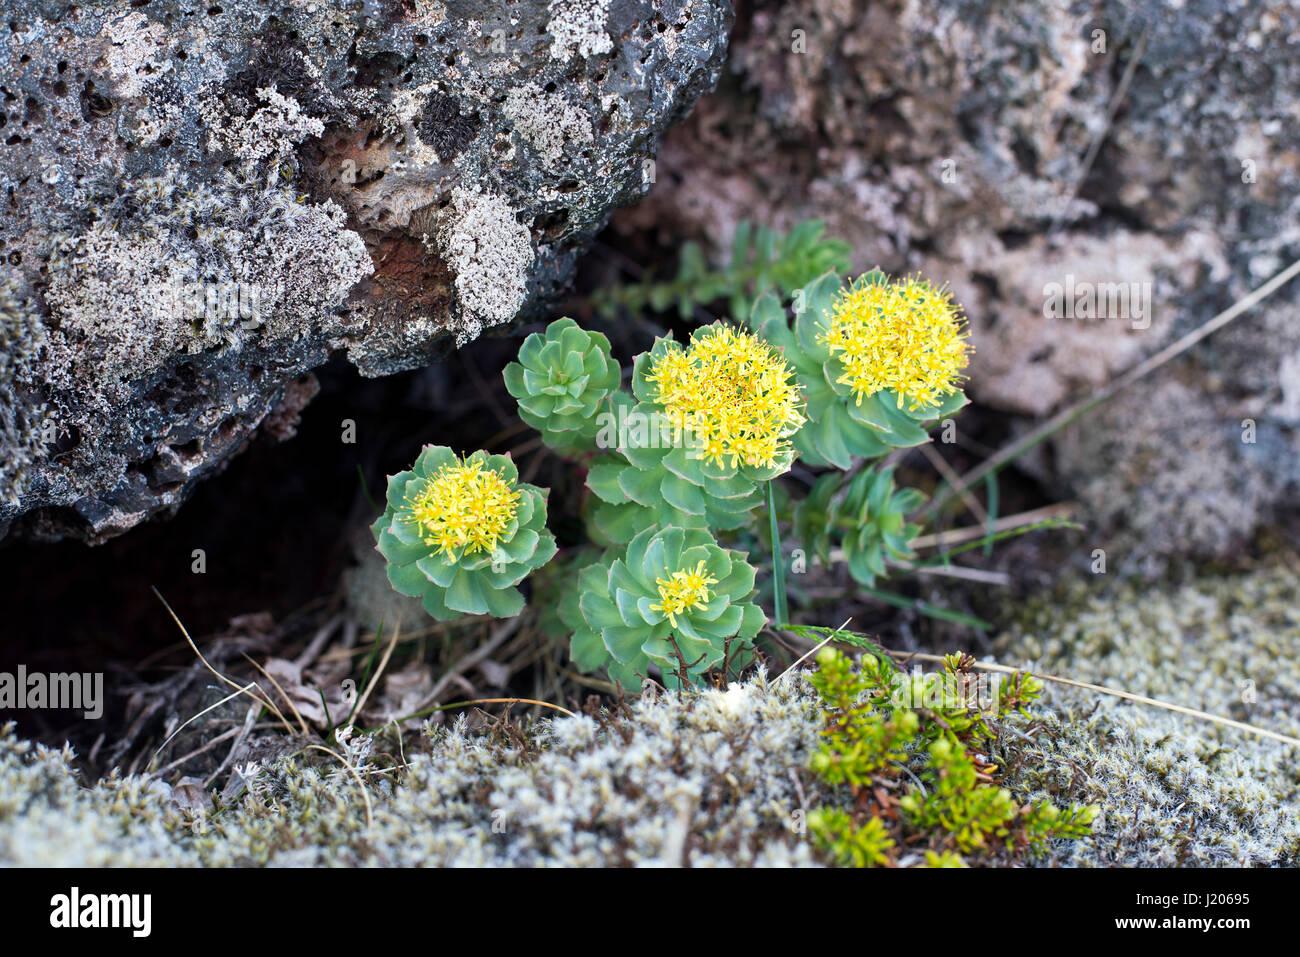 Burnirót (Rhodiola rosea) growing in Neshraun lava fields, Western Iceland. - Stock Image